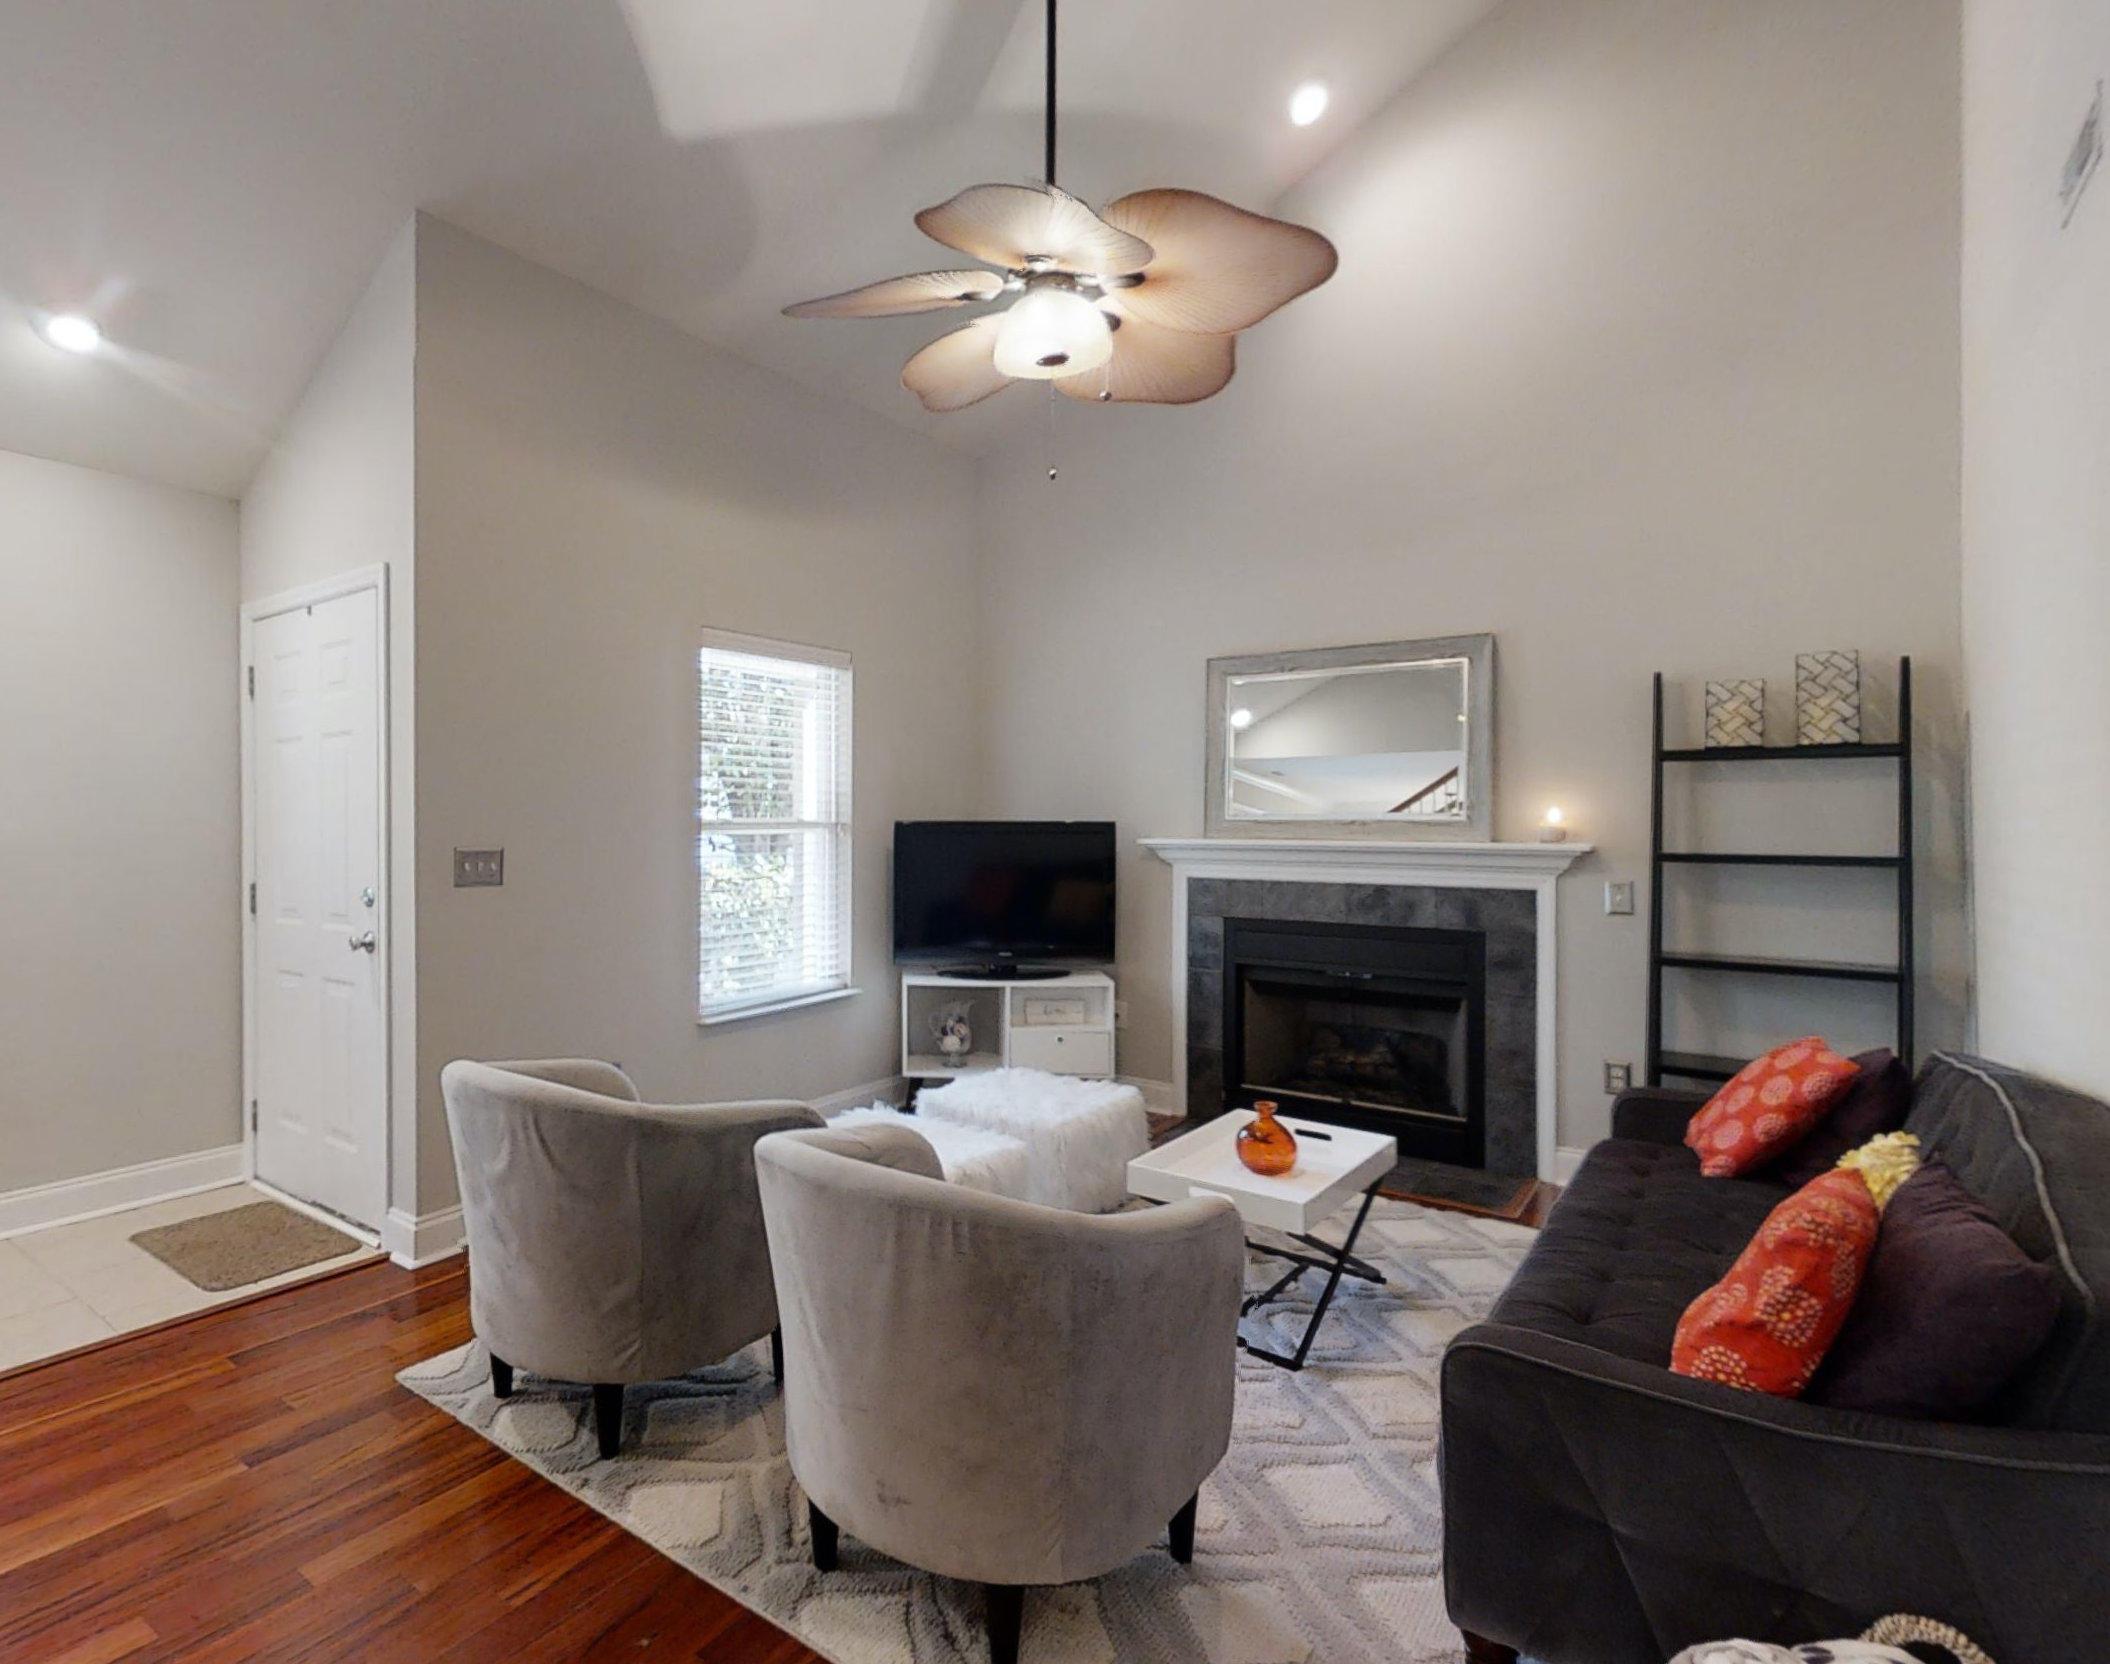 Longbranch Point Homes For Sale - 940 Estates, Charleston, SC - 15